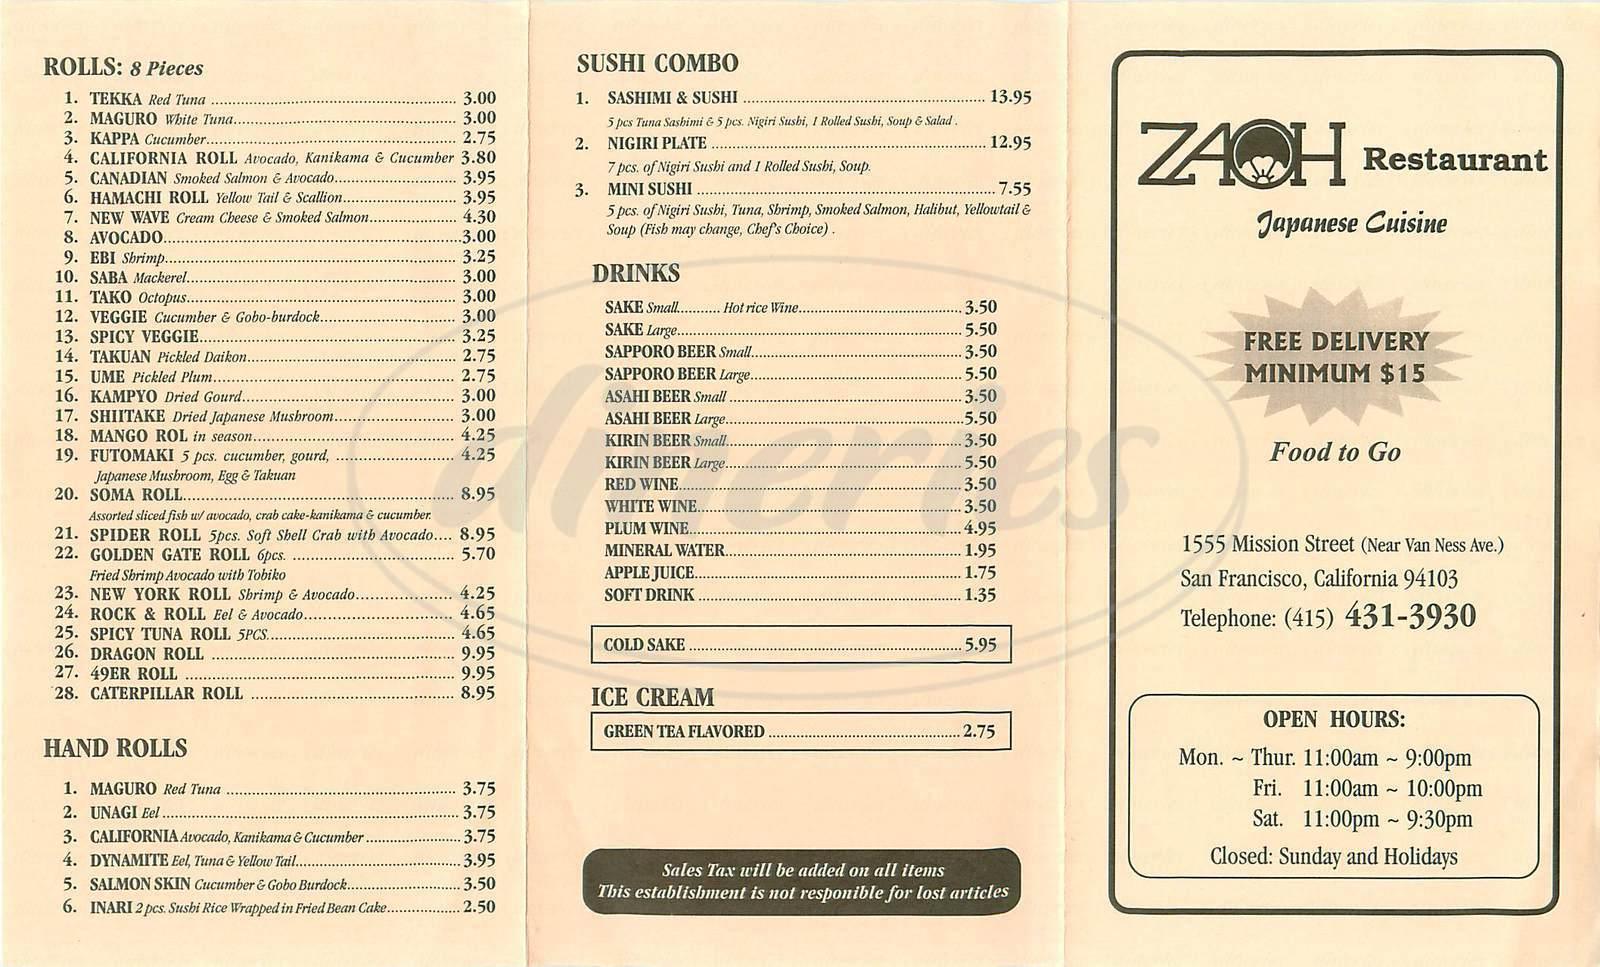 menu for Zaoh Restaurant